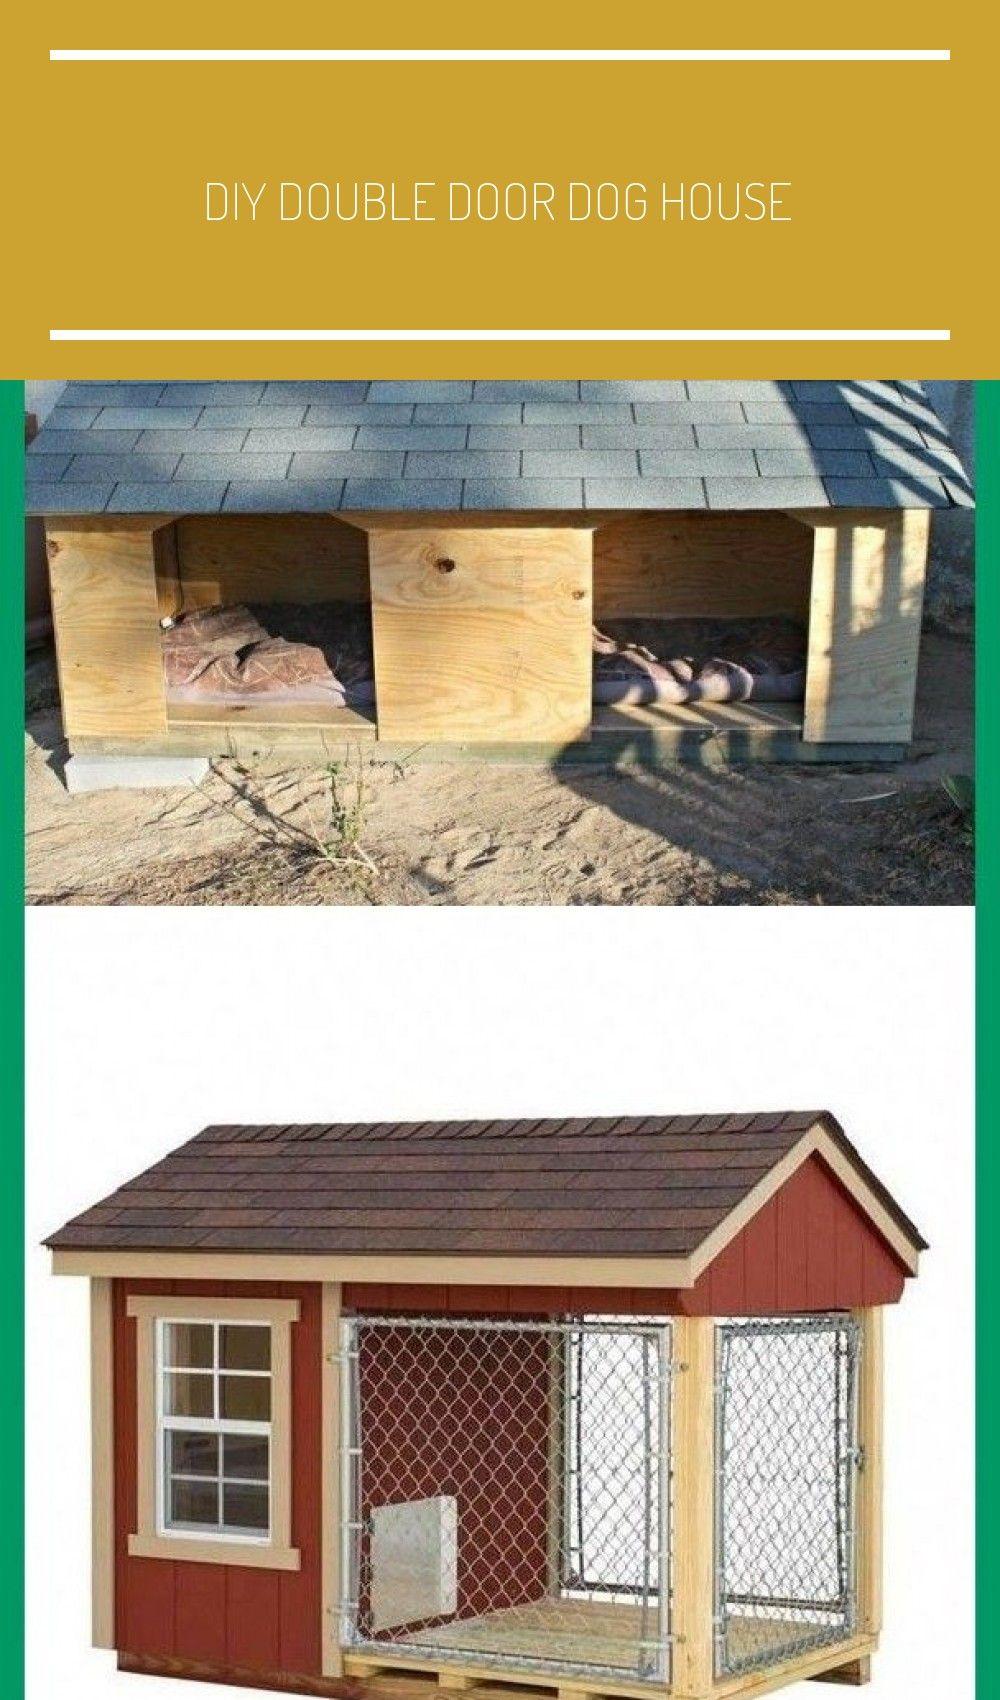 Diy Double Door Dog House In 2020 Double Doors Cheap Dog Kennels Dog Kennel Outdoor